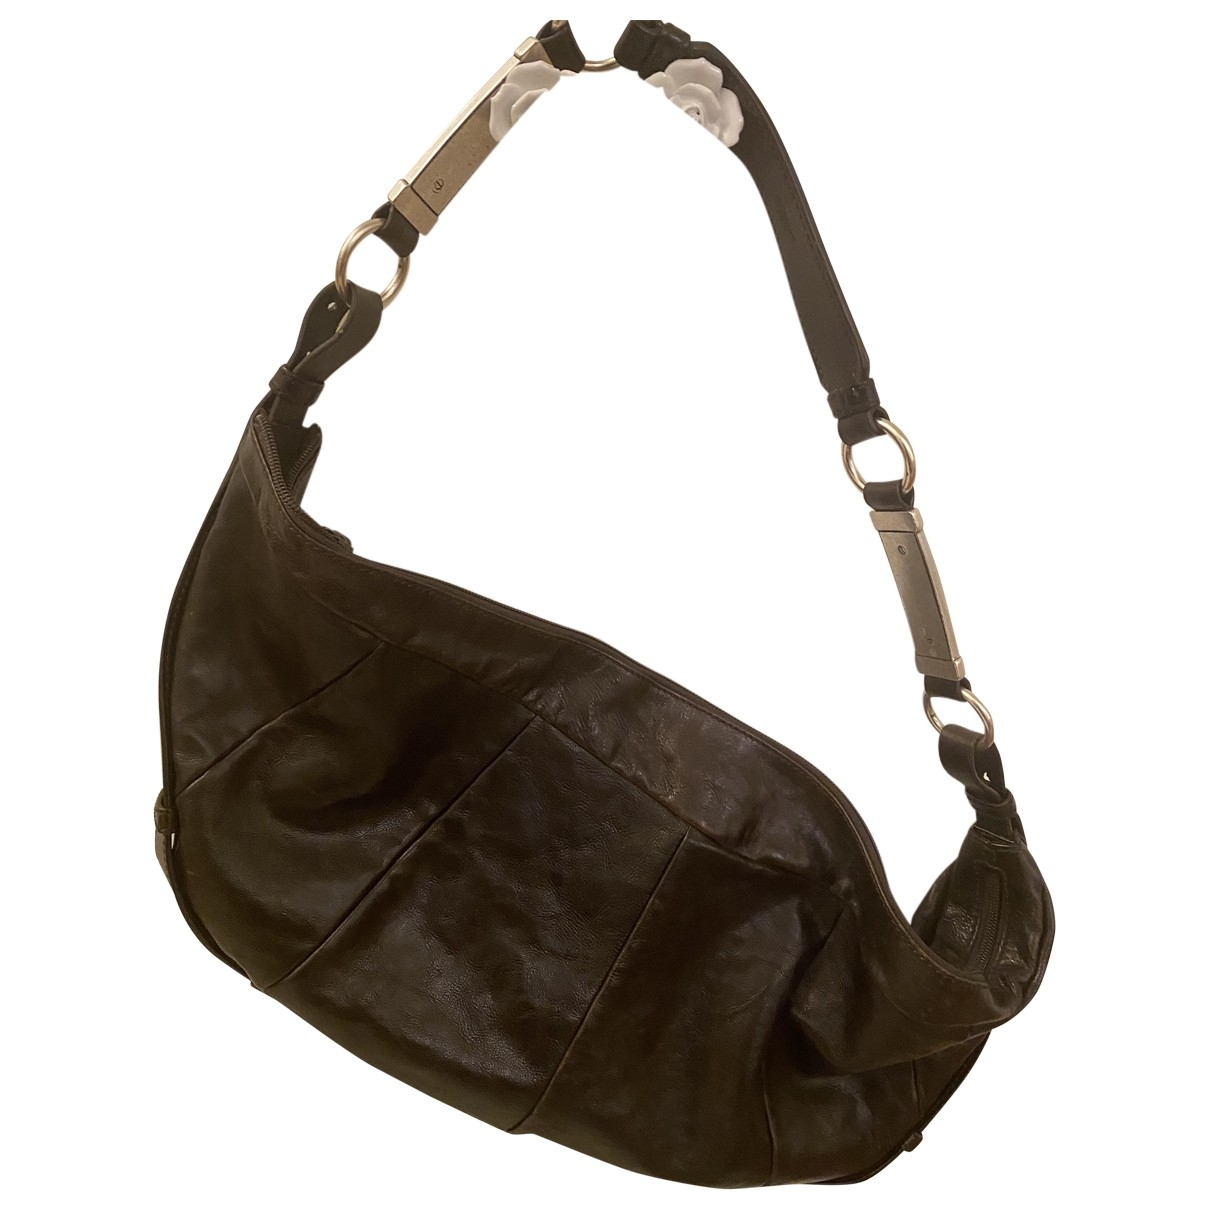 Yves Saint Laurent \N Handtasche in  Braun Leder